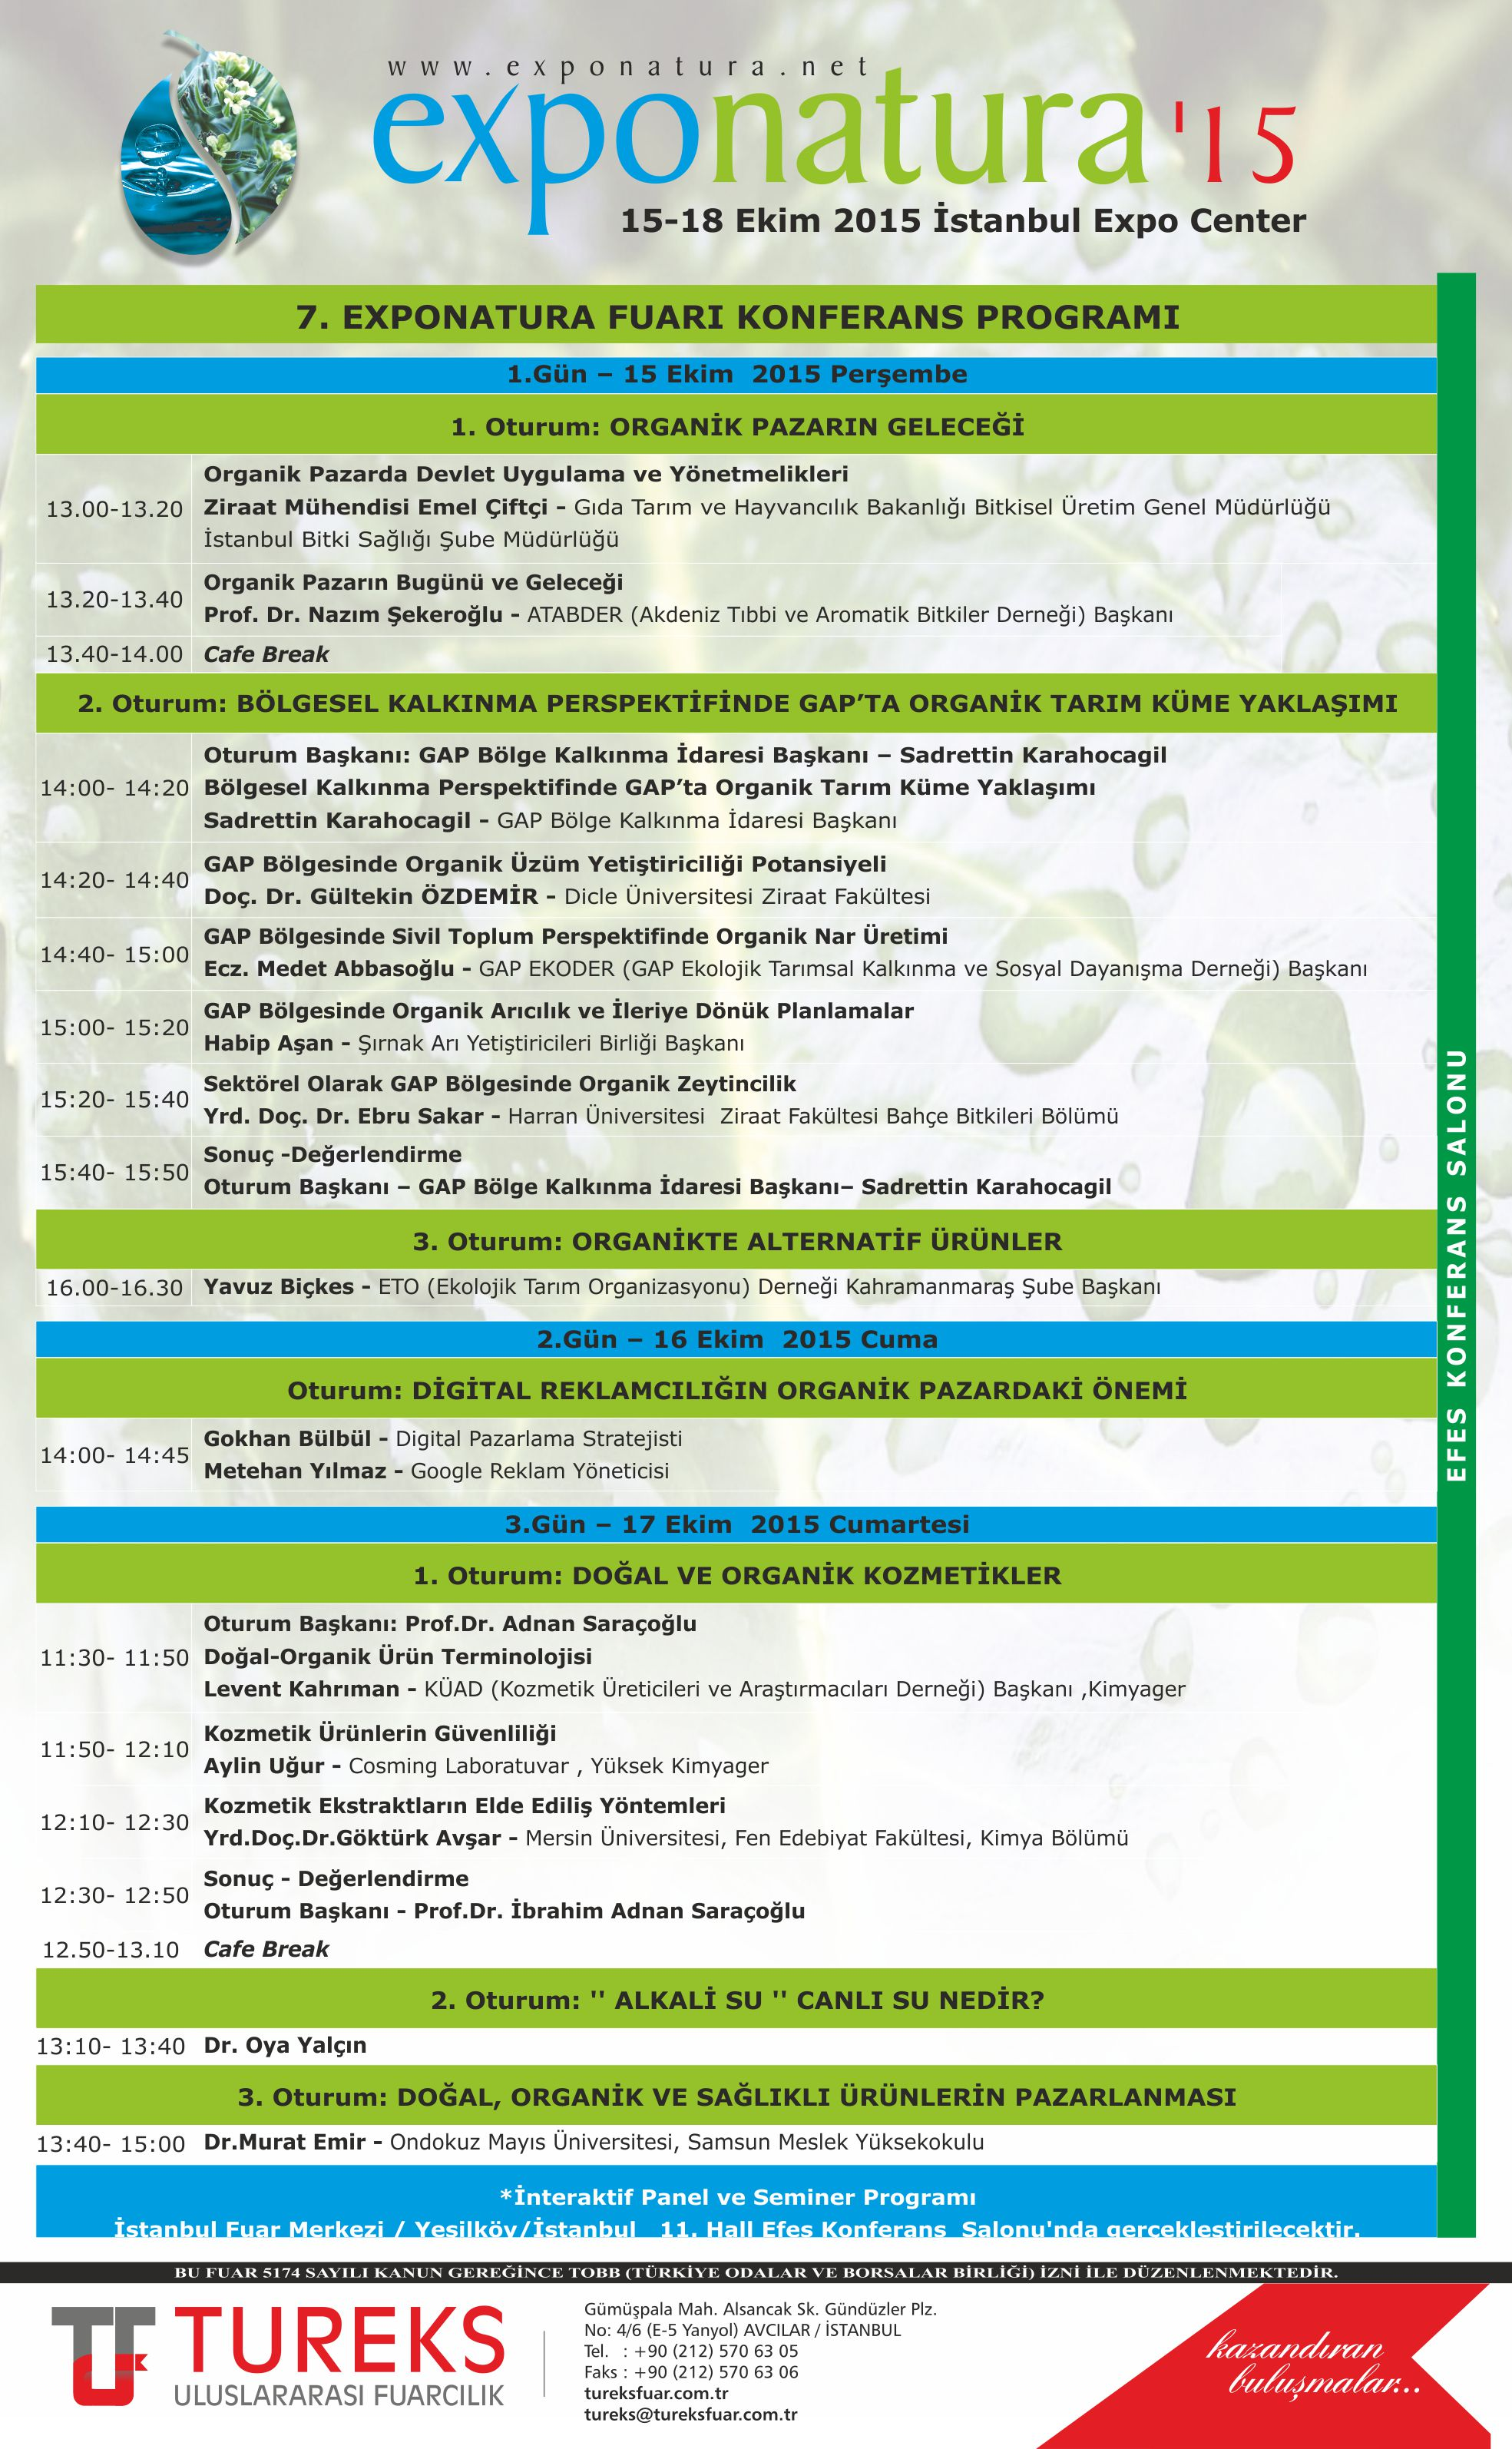 konferans_programi